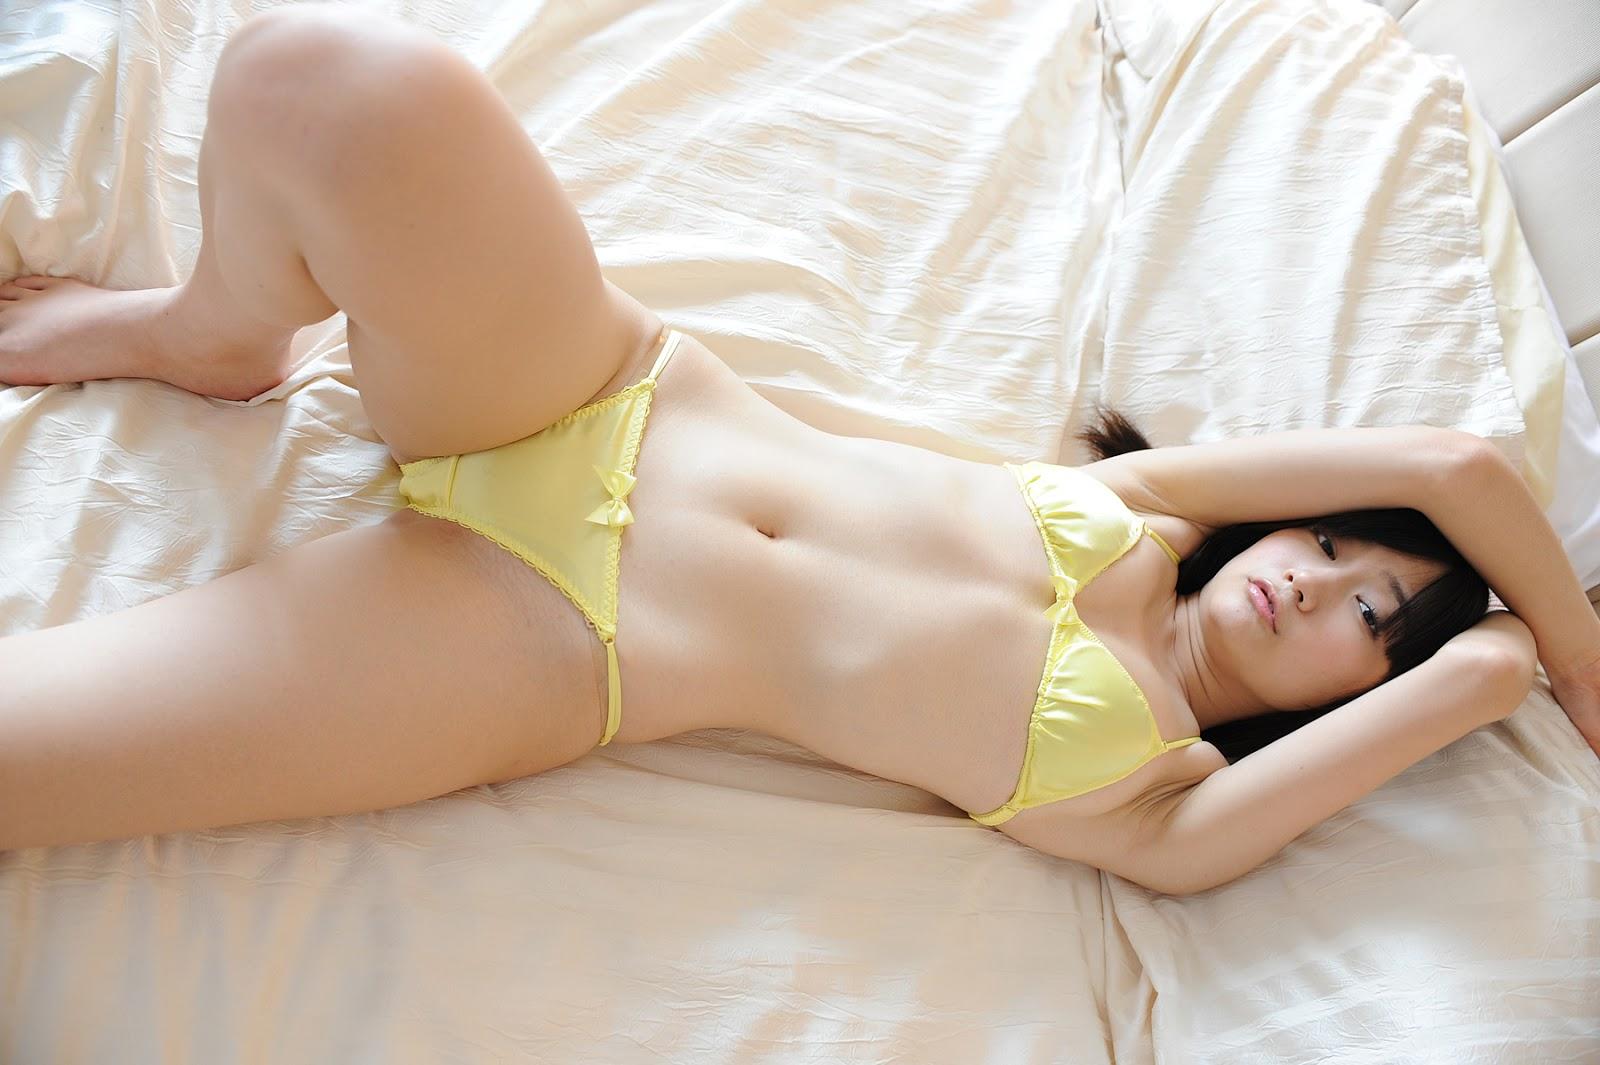 big ass arab sexy hot